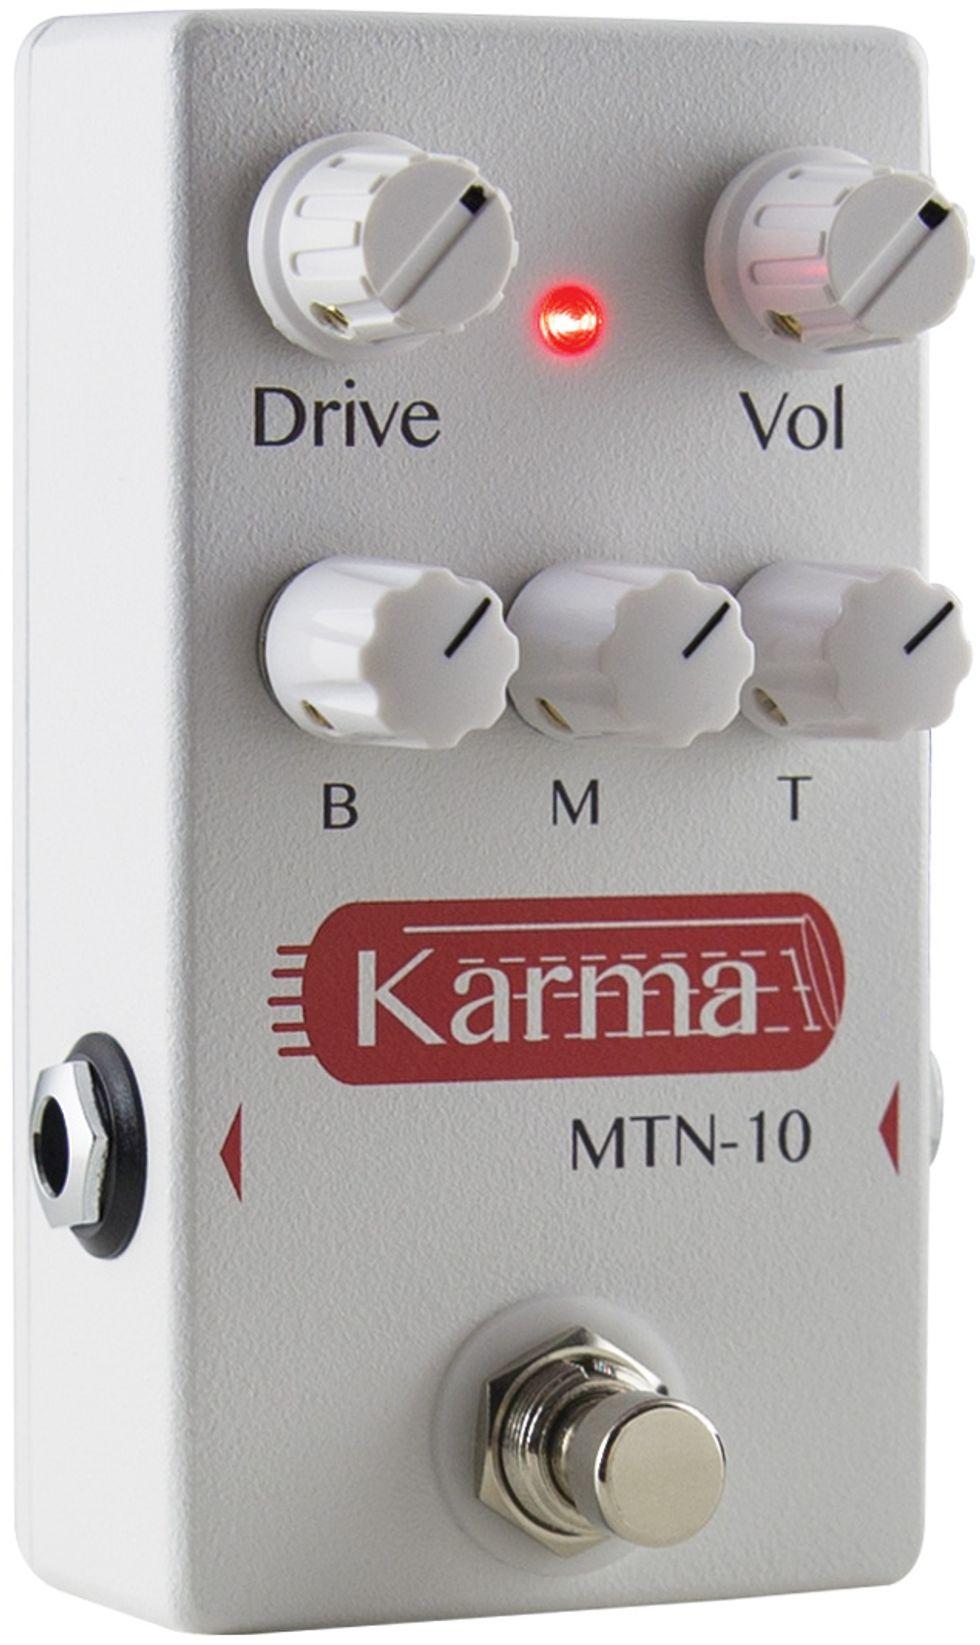 karma - homepage